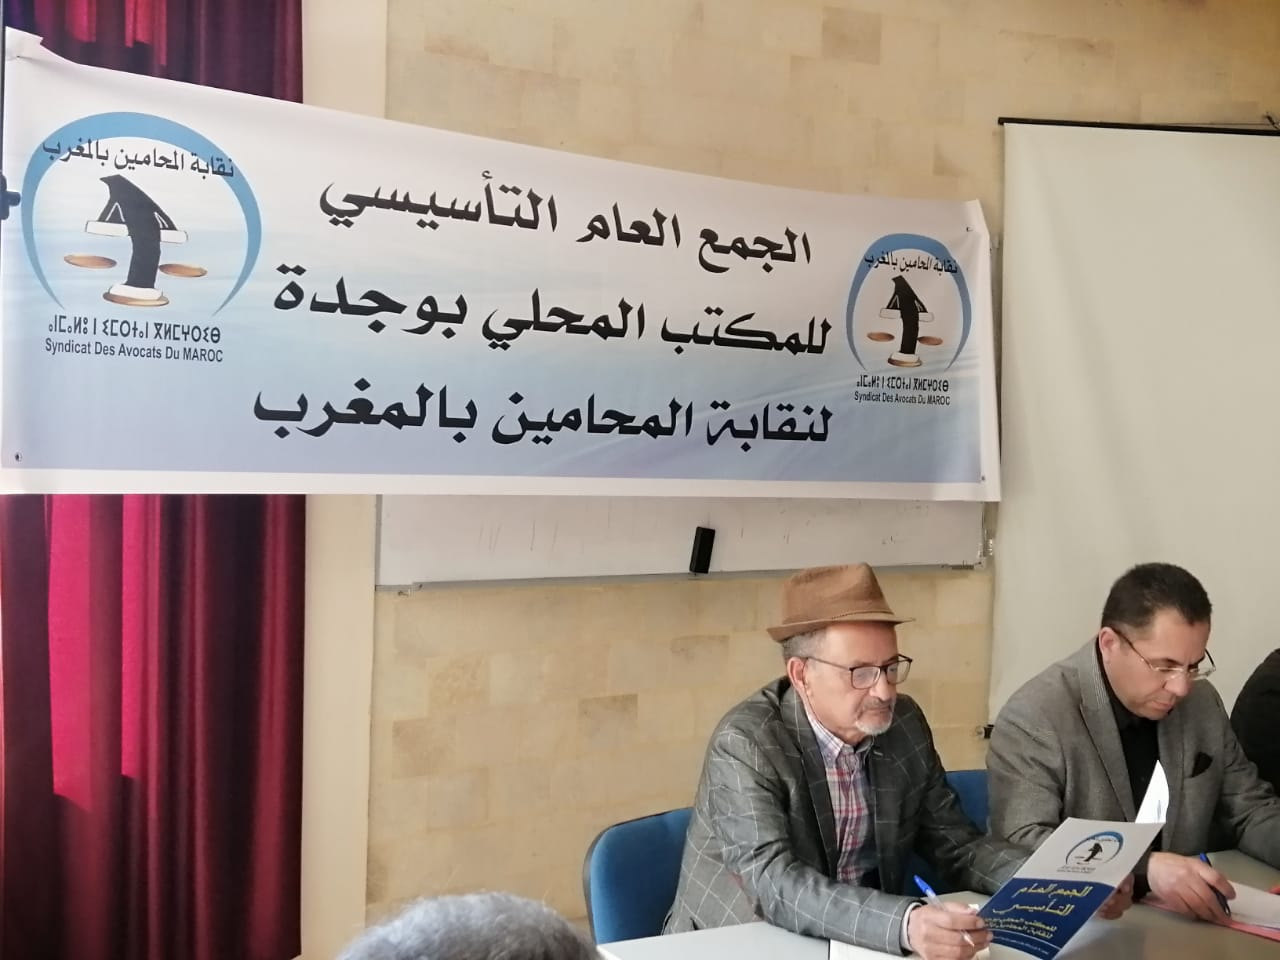 Photo of وجدة / انتخاب مكتب الفرع المحلي لنقابة المحامين